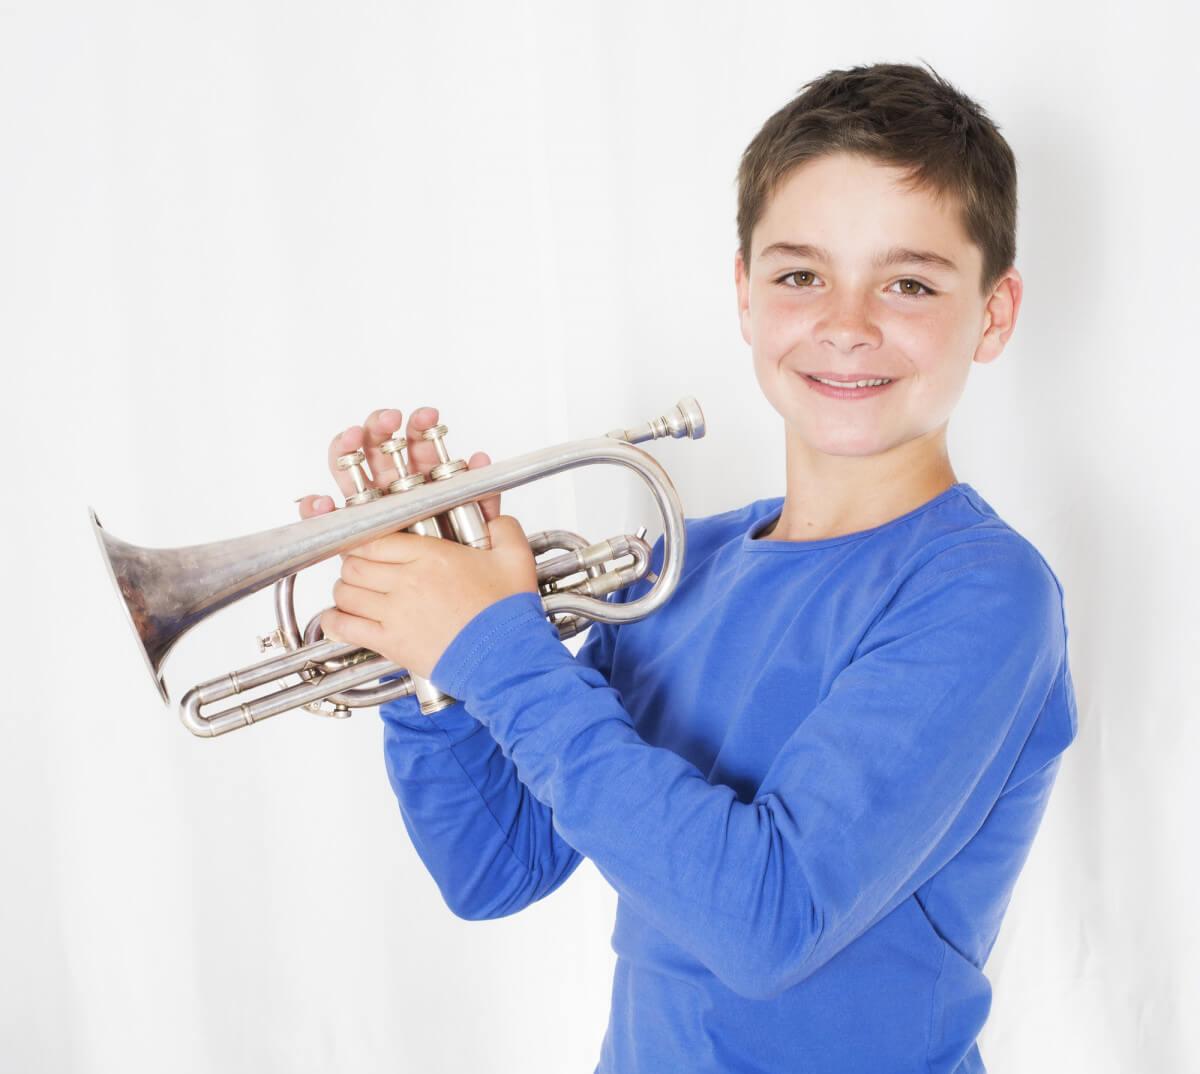 Online Trumpet Course Information